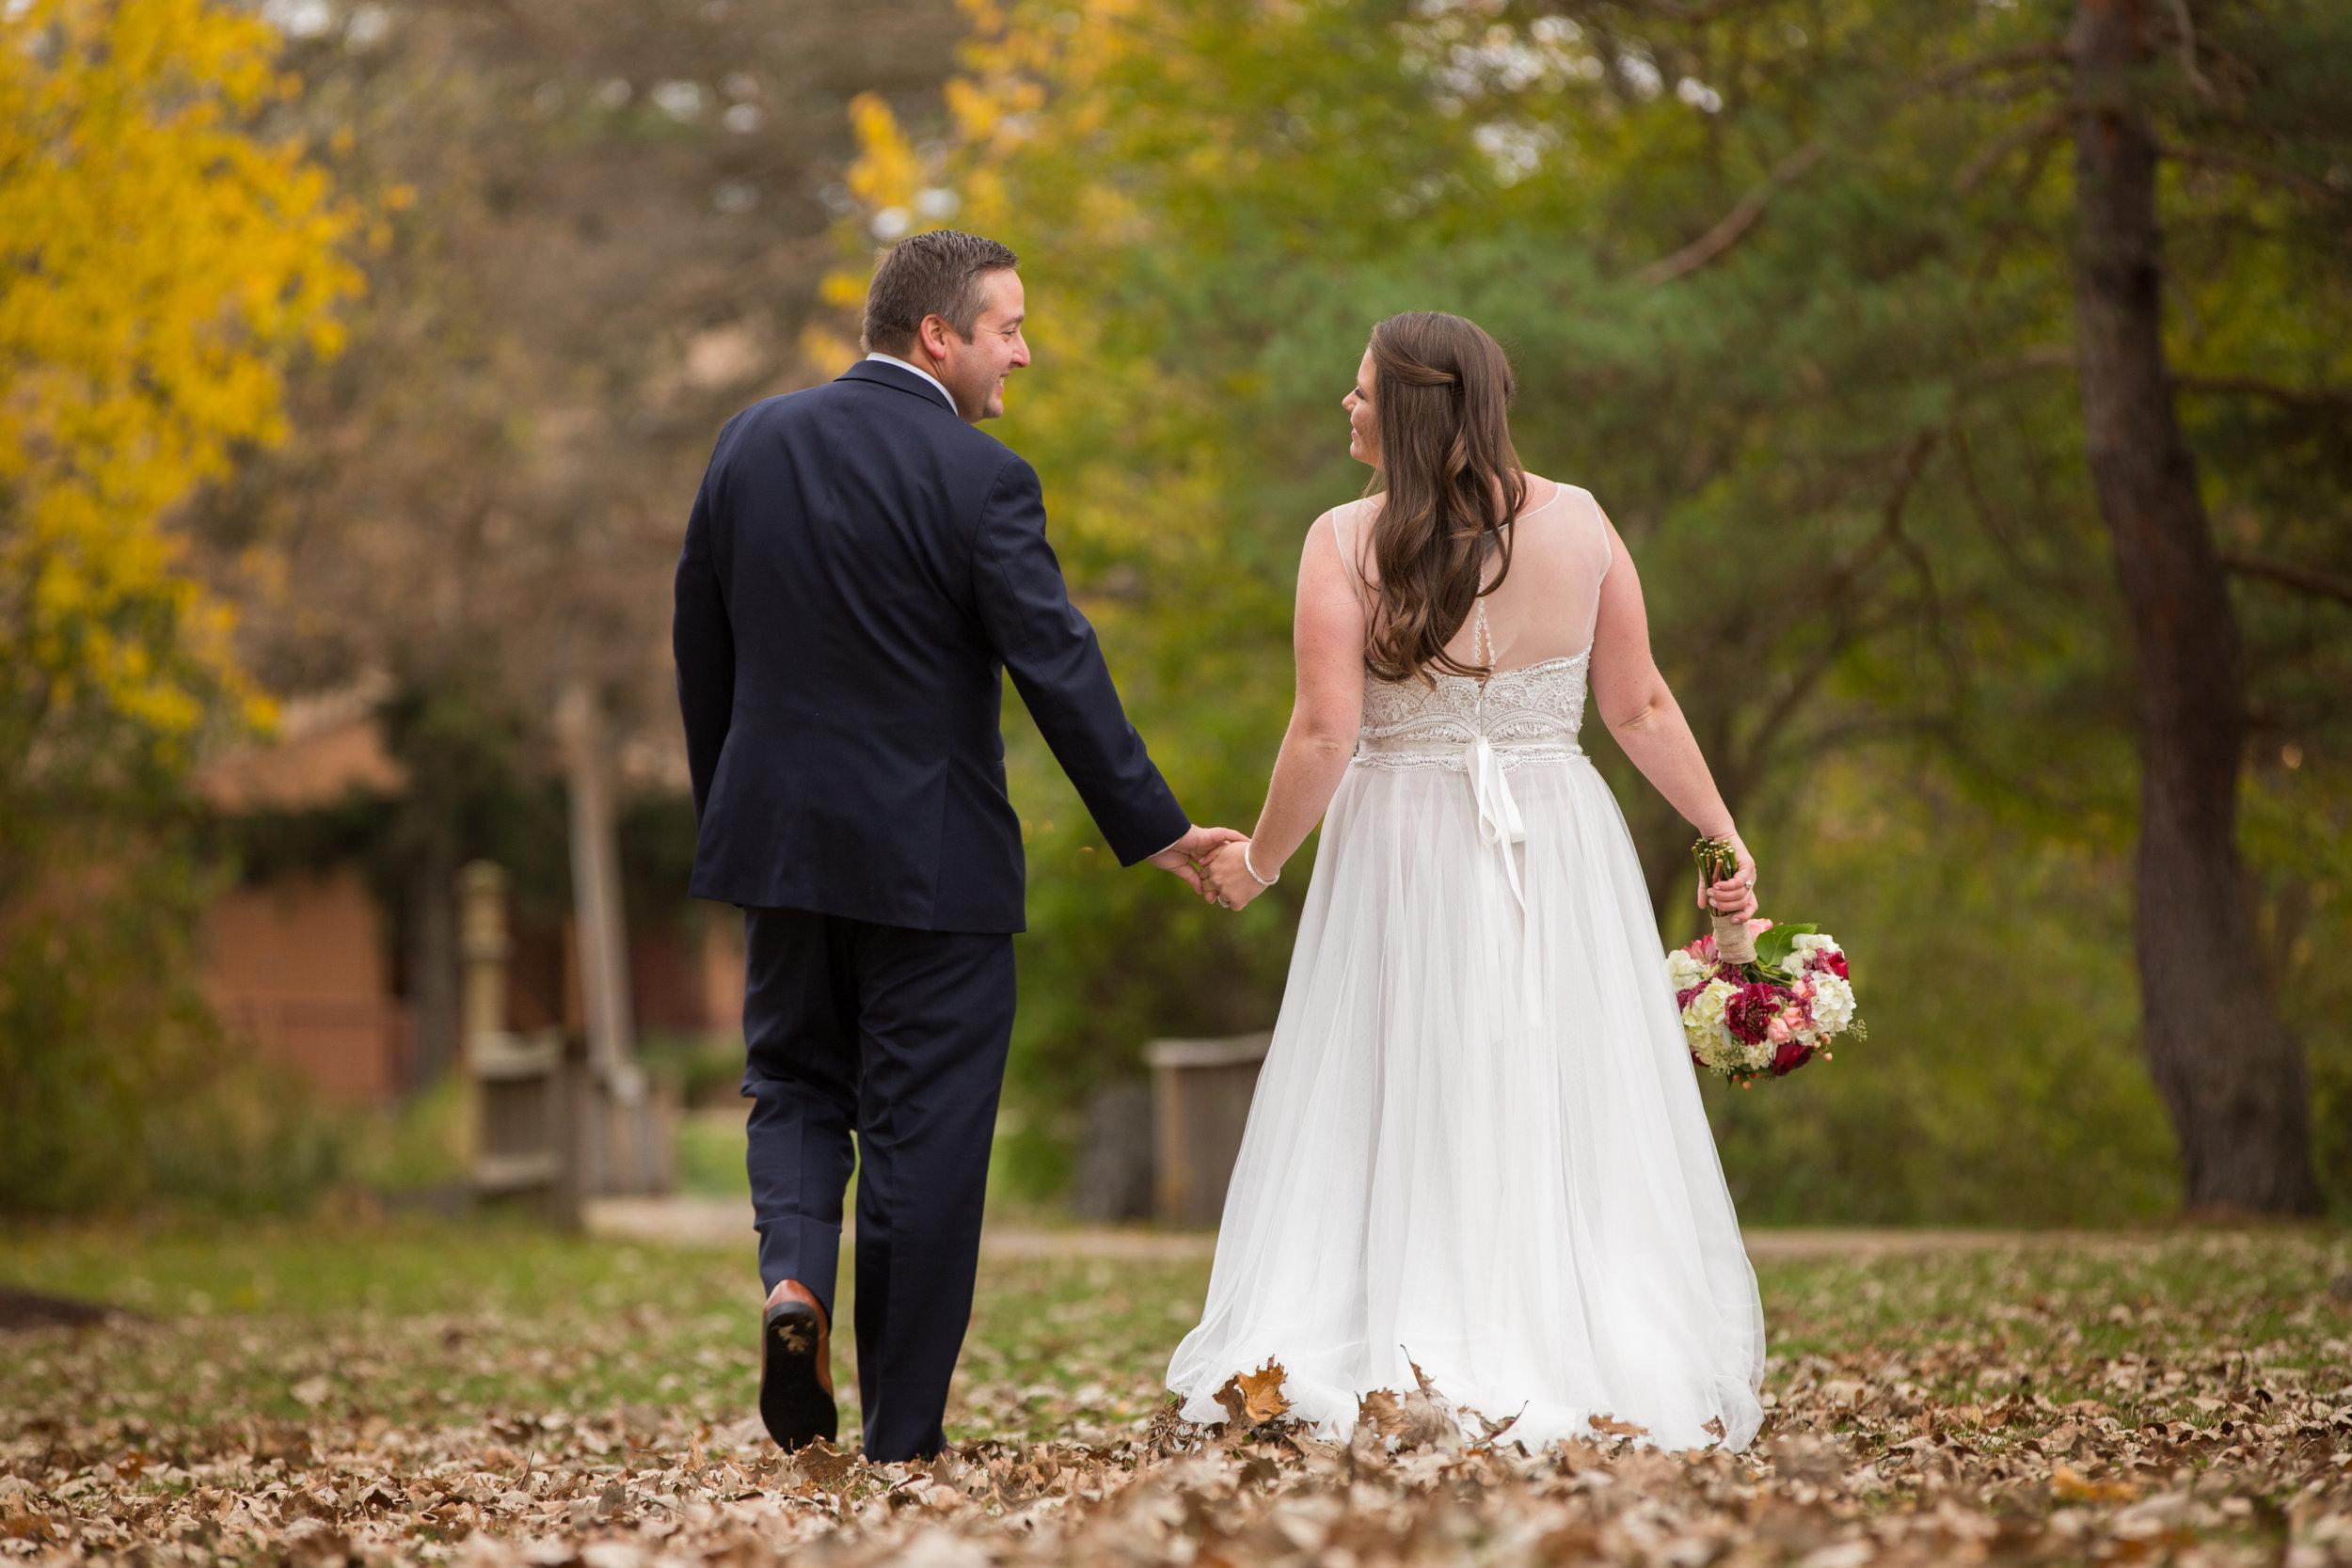 2017-10-28_Kathryn_Ryan_Wedding-20.JPG